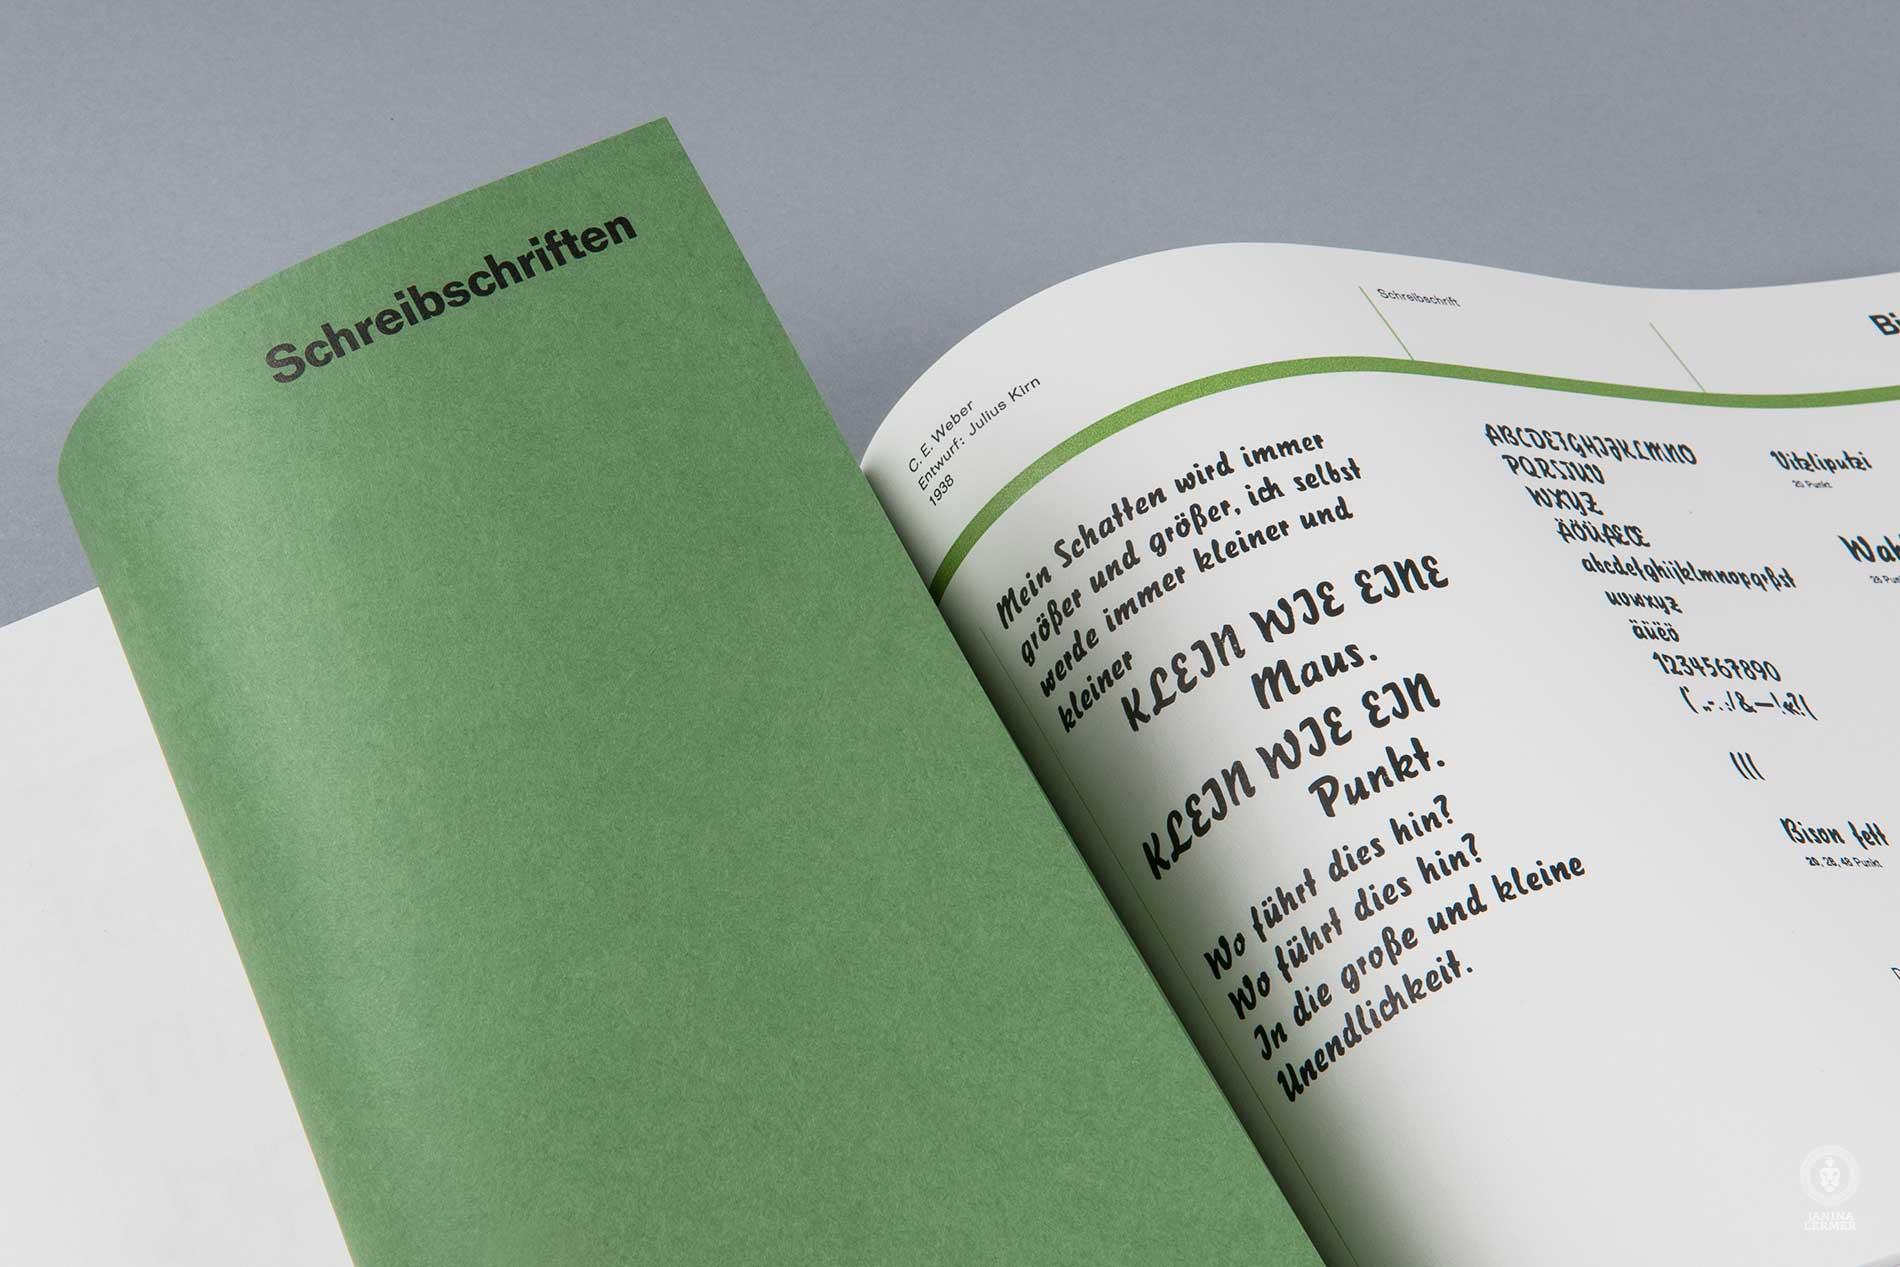 Janina-Lermer-Buchgestaltung-Magazingestaltung-Editorialdesign-Bleisatz-Metalype-Schreibschriften-Script-Handgedruckt-Handprinted-Werkstatt-Fliegenkopf